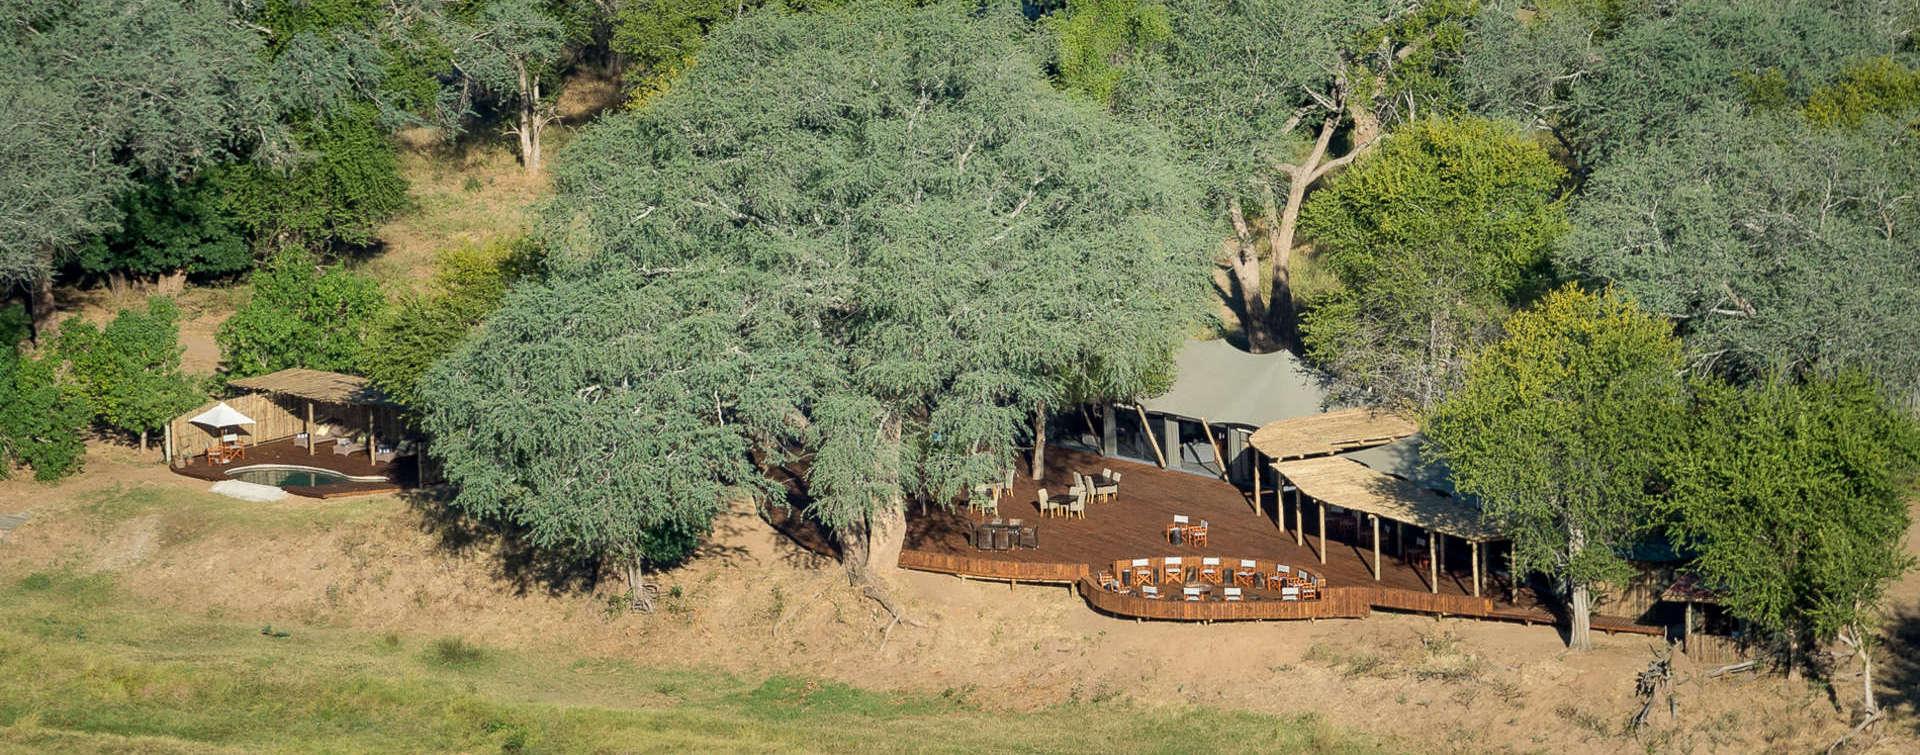 ruckomechi-camp-zimbabwe-aerial